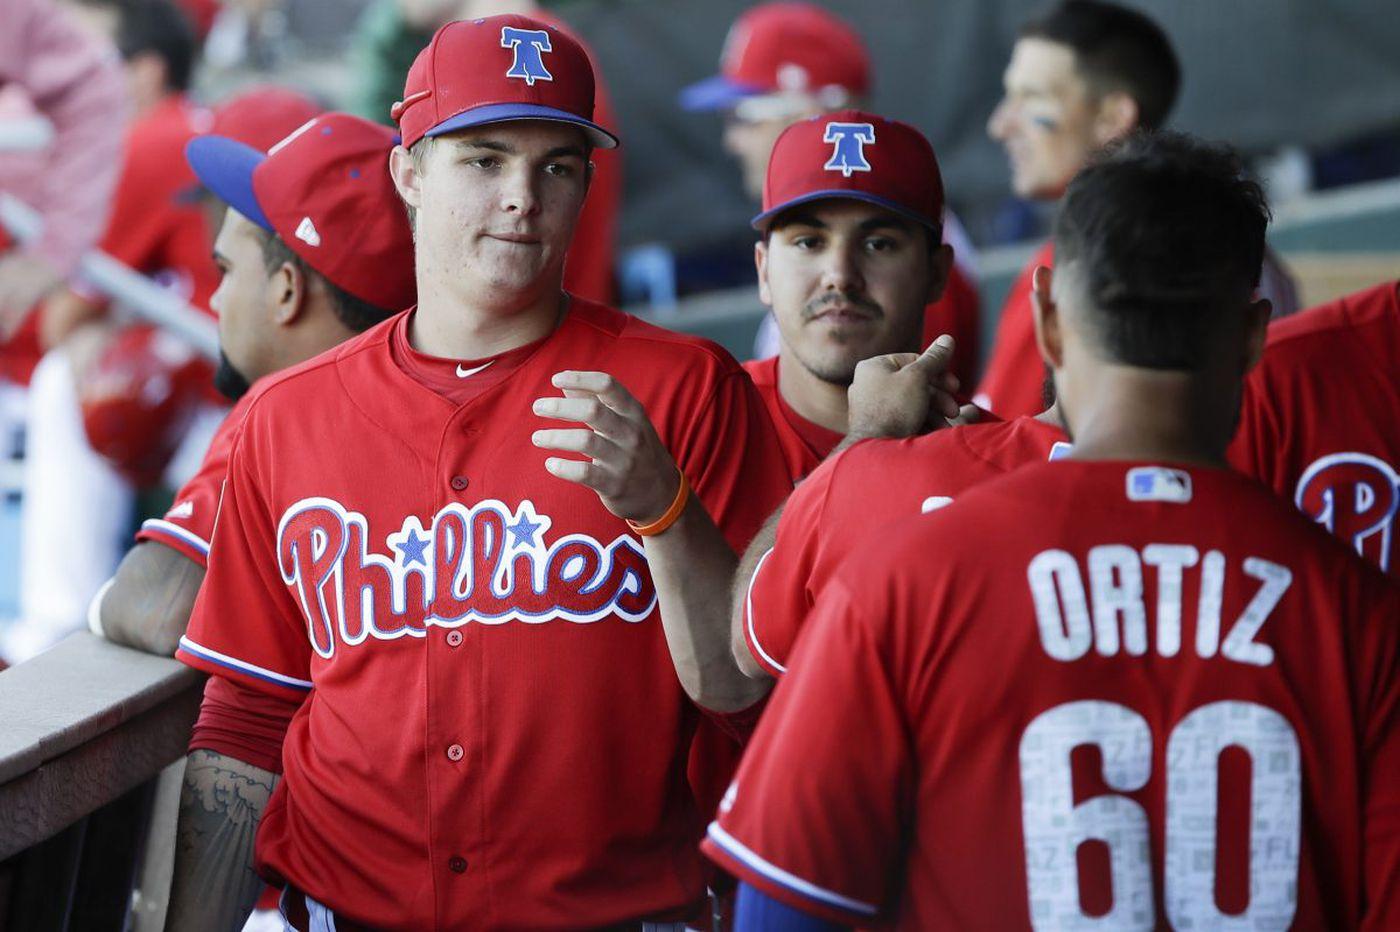 Phillies prospect Mickey Moniak 'grateful' for last year's struggles